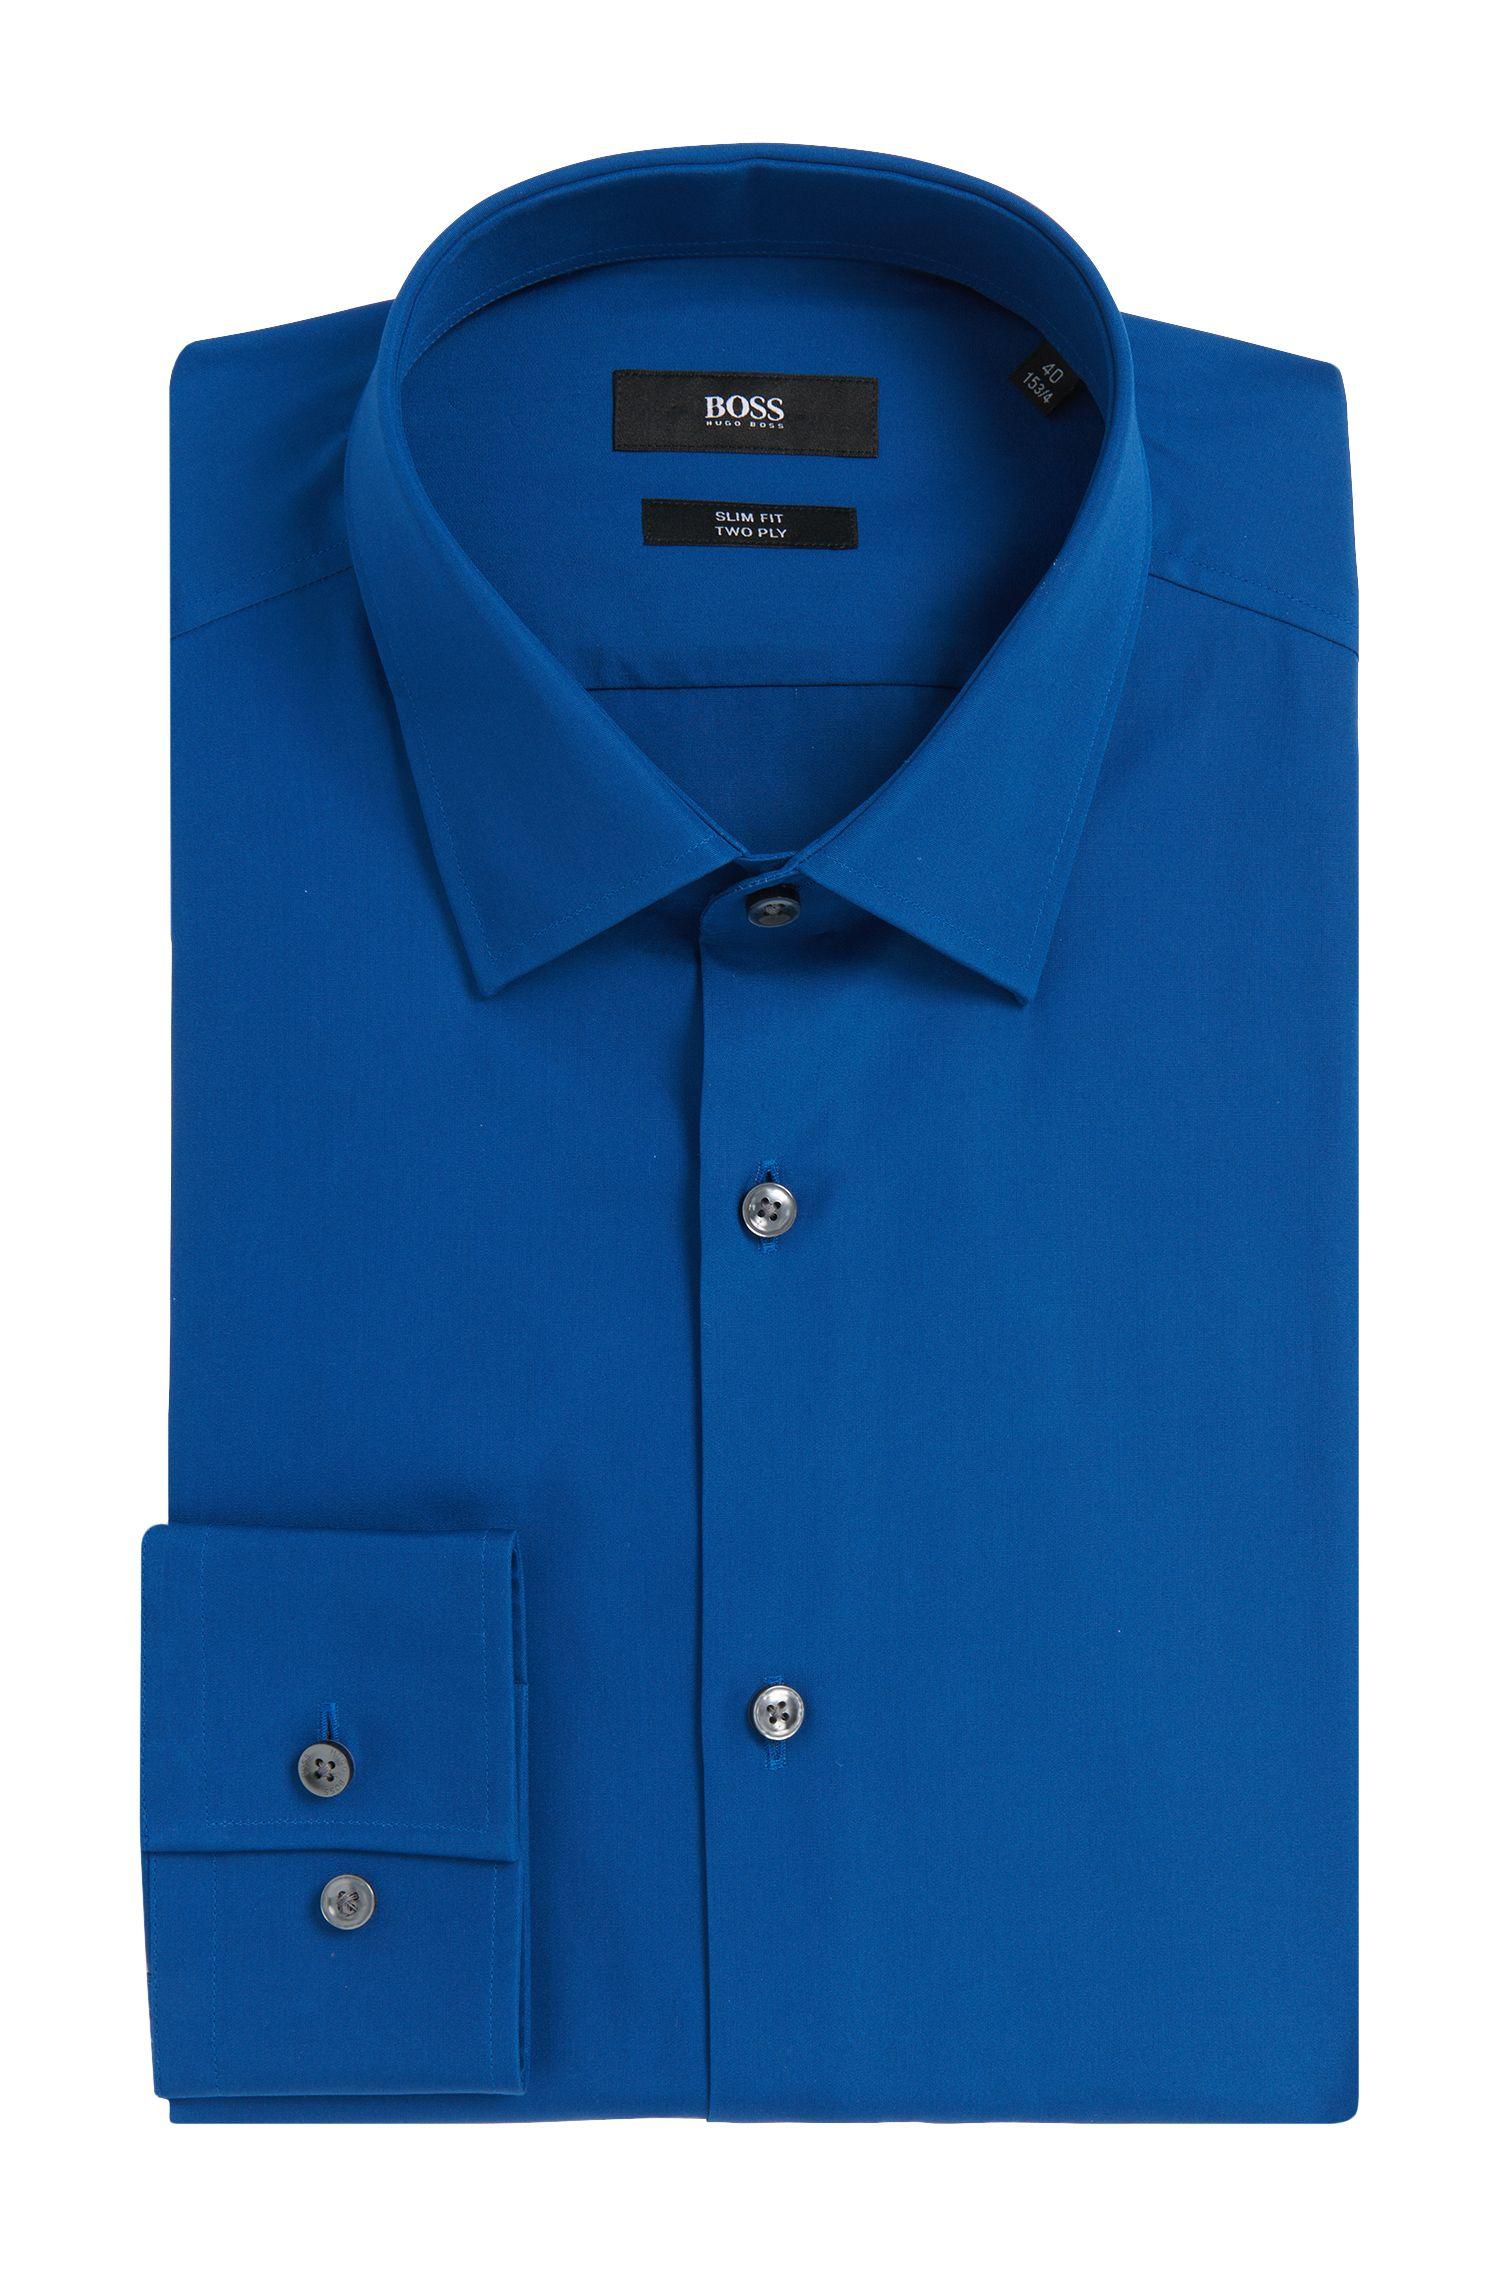 'Jenno' | Slim Fit, 2-Ply Italian Cotton Dress Shirt